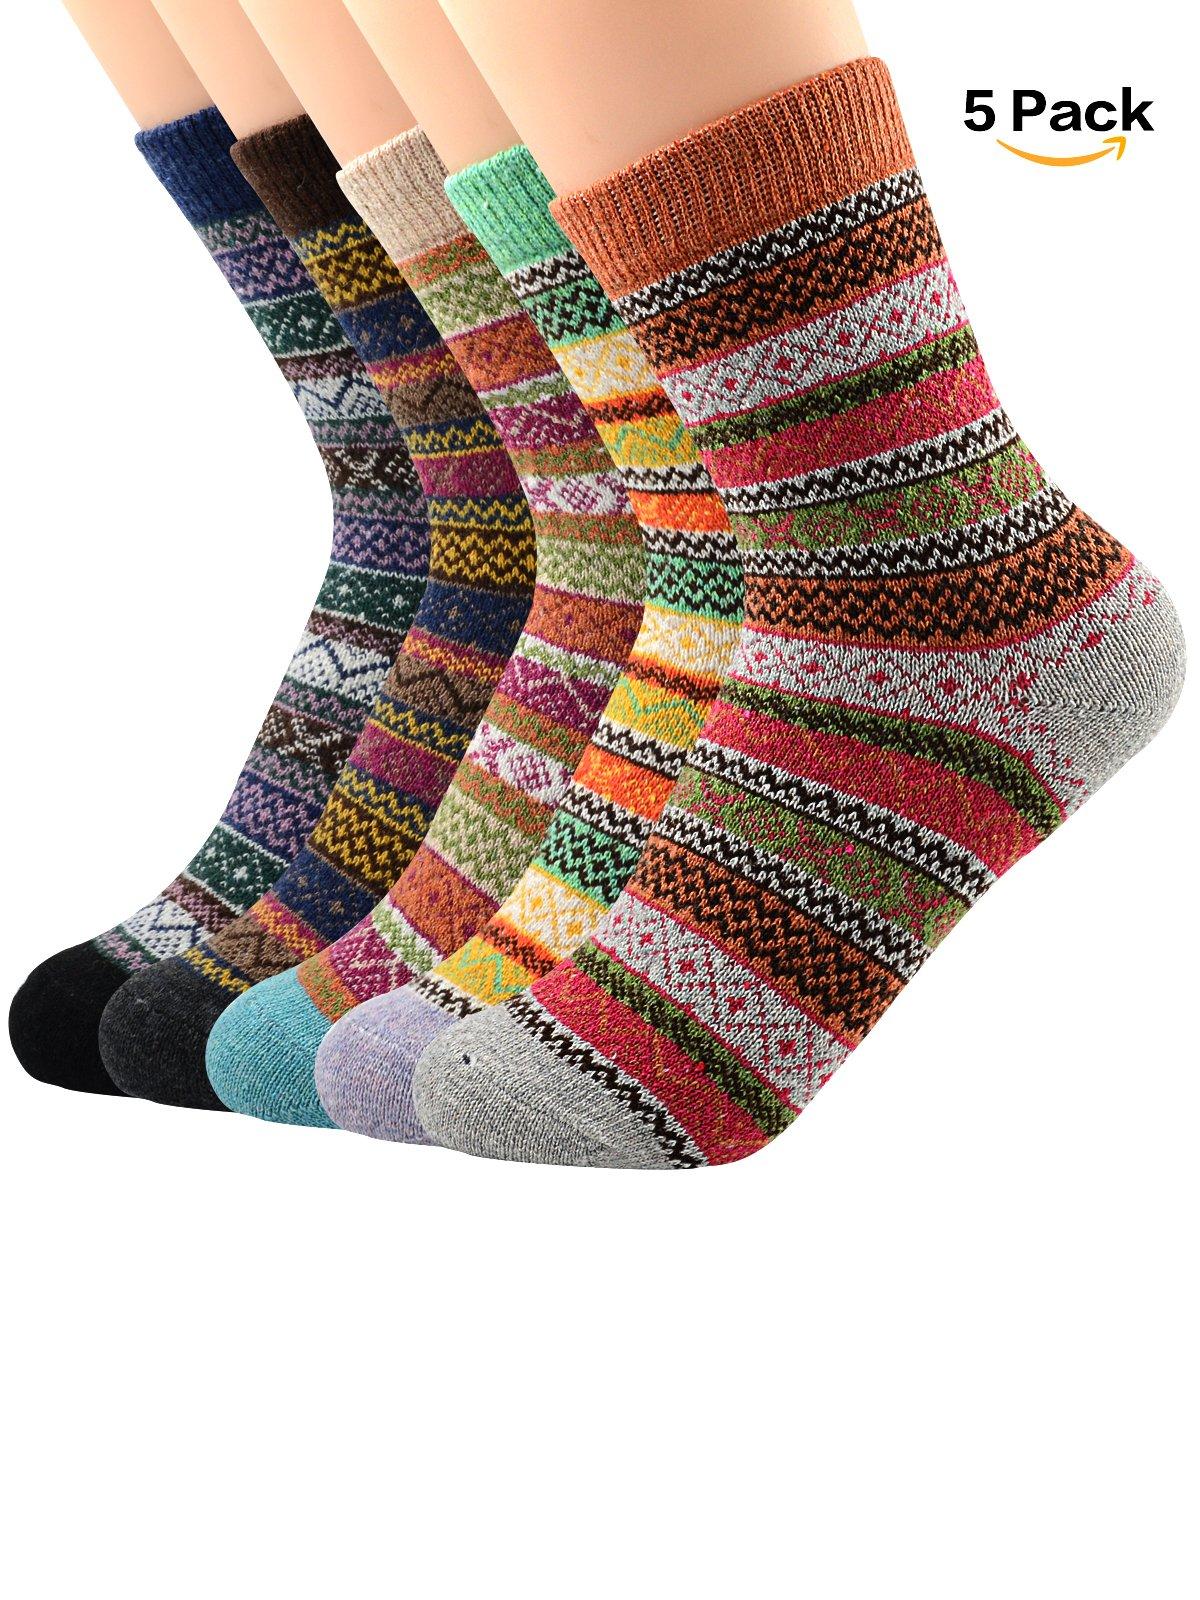 Century Star Women's Vintage Winter Soft Wool Warm Comfort Cozy Crew Socks 5 Pack 5 Pairs Stripes